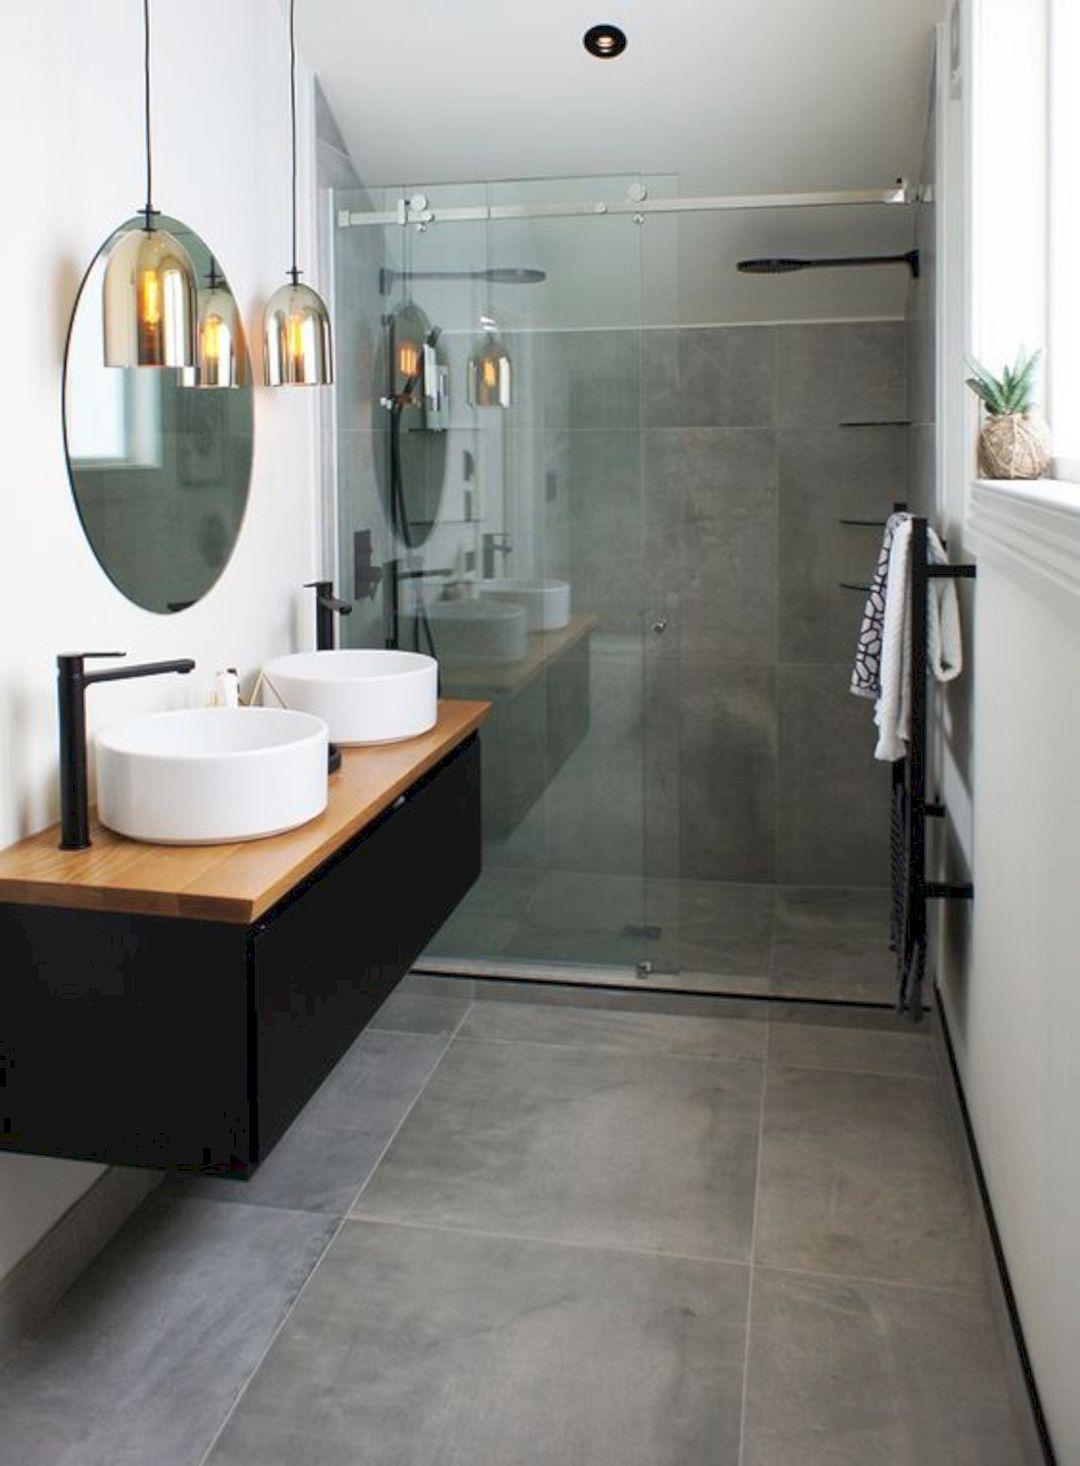 15 ensuite bathroom ideas  bathroom floors diy small